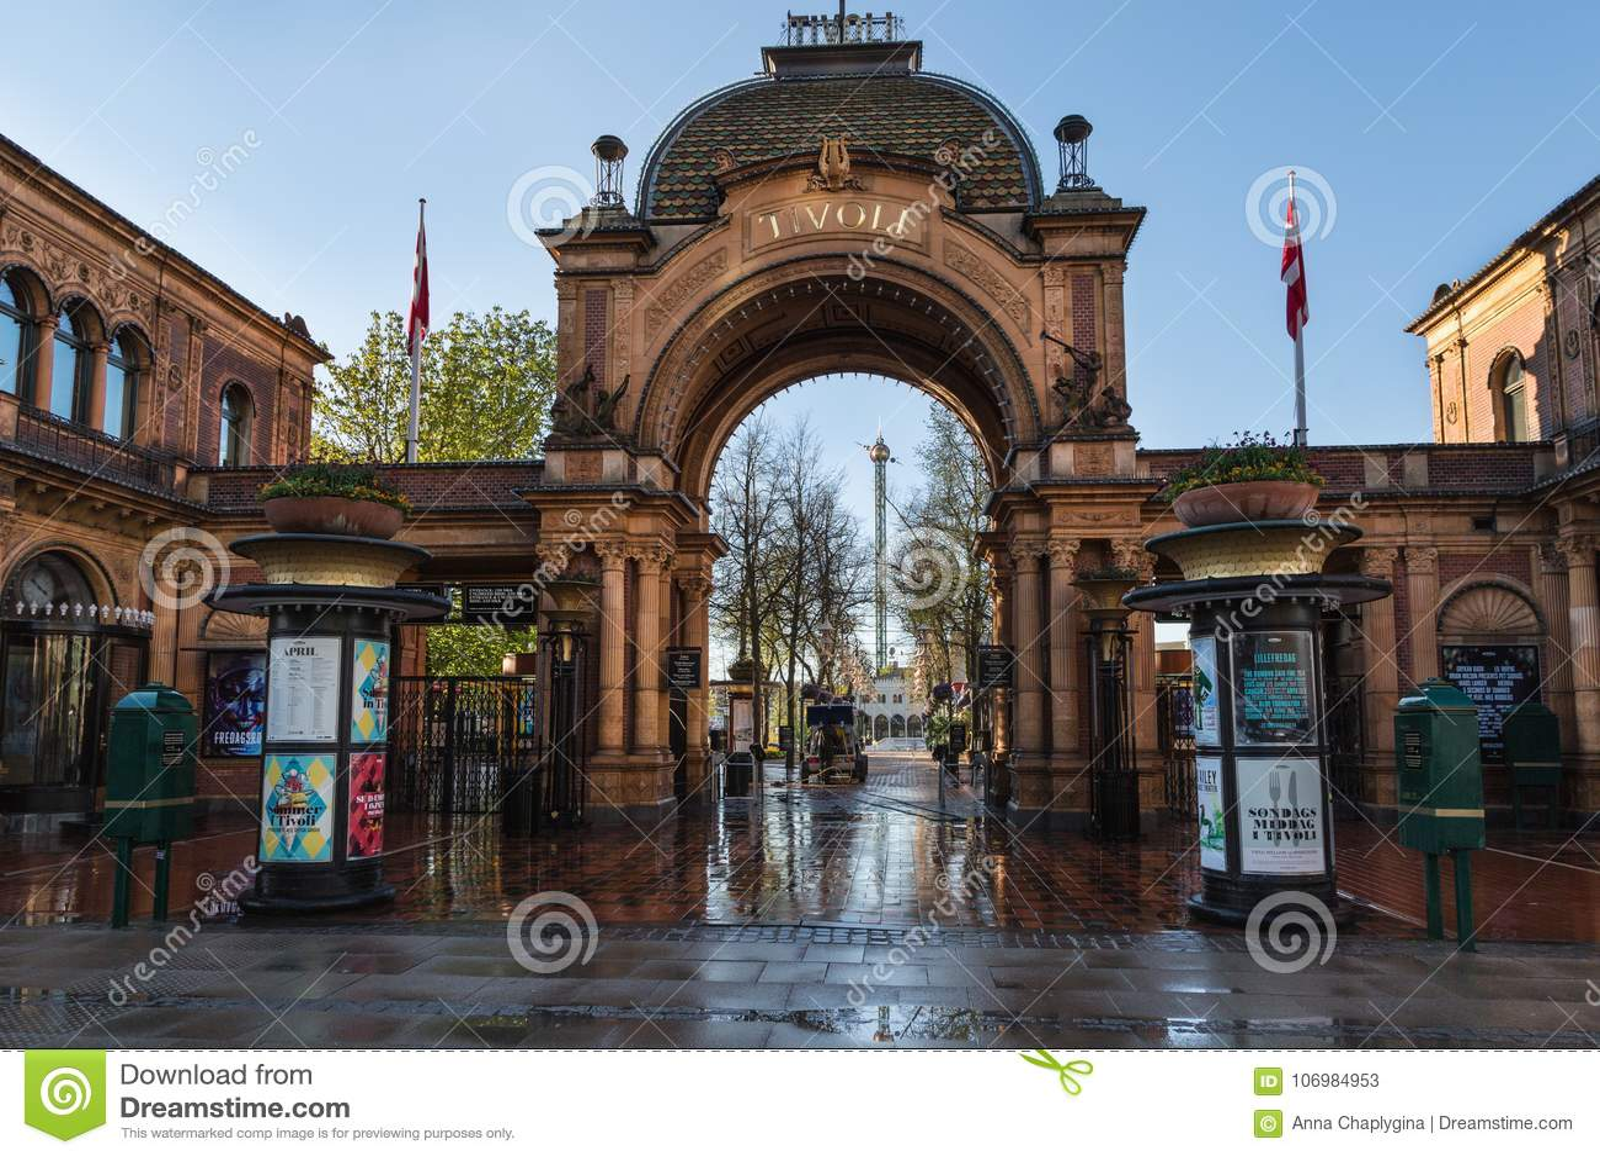 Copenhaghen danimarca 30 aprile 2017: i giardini di tivoli